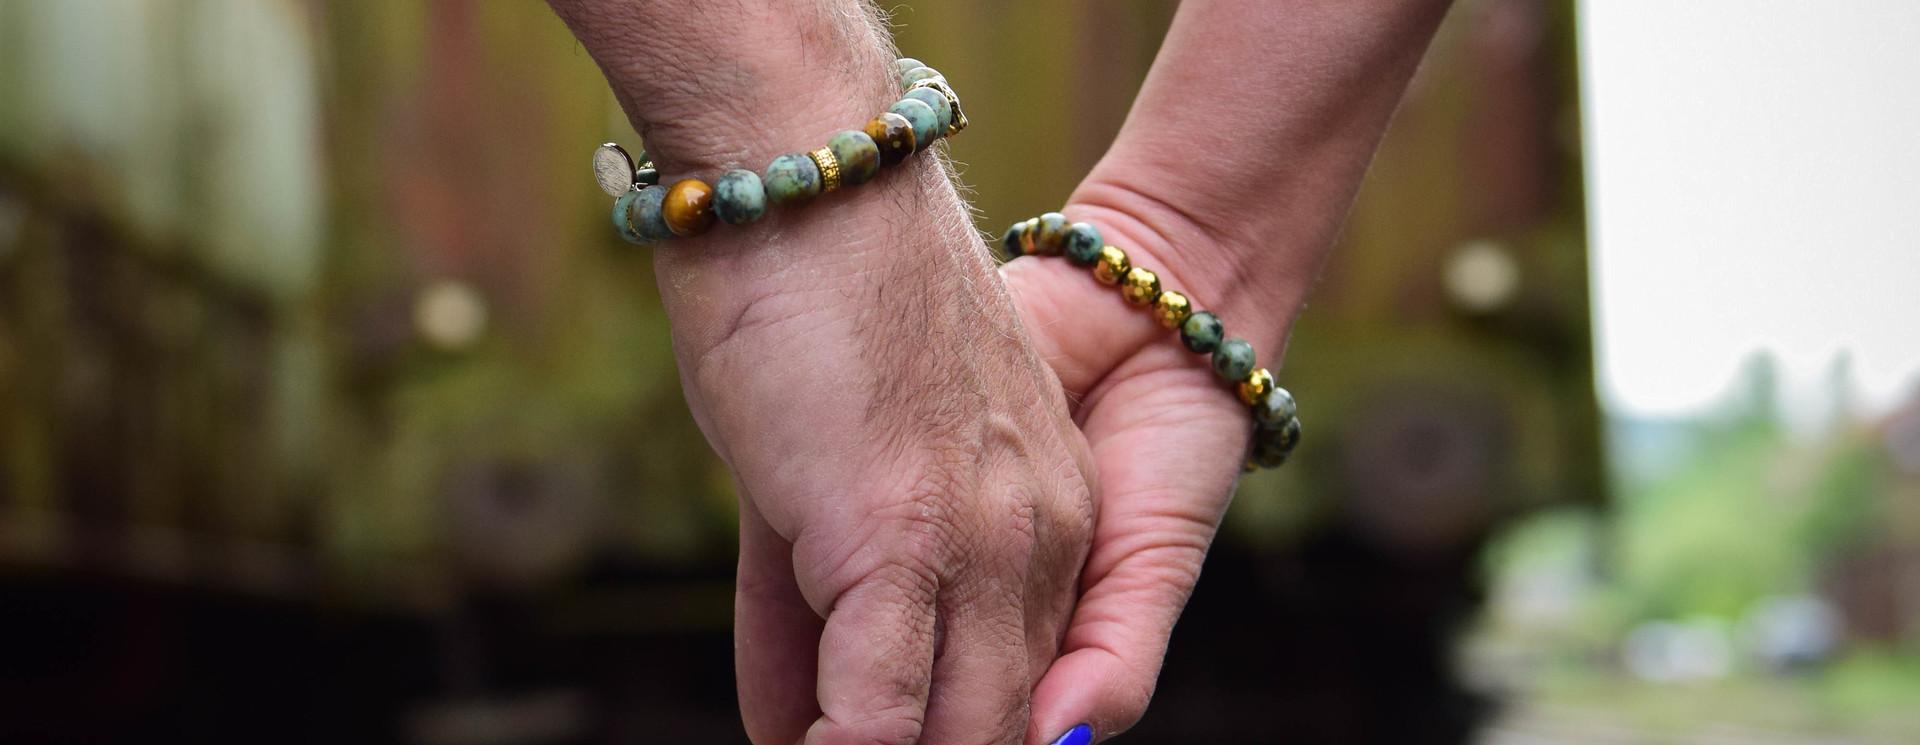 Other handmade jewelry